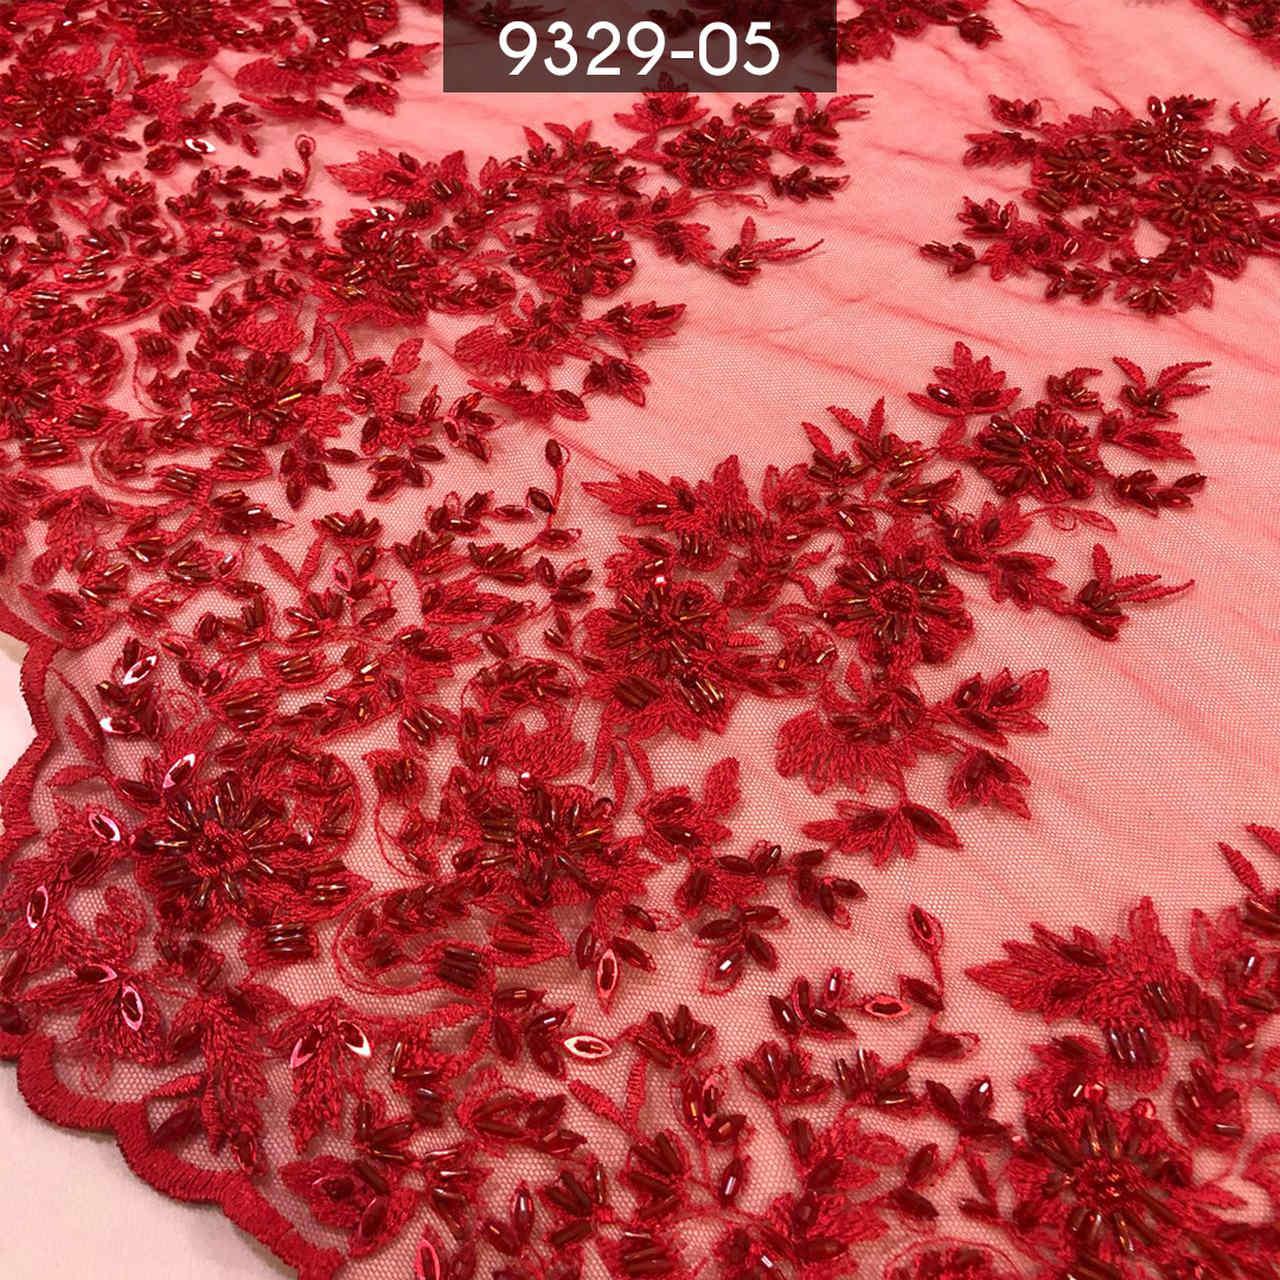 Tecido Renda Bordada Vermelha